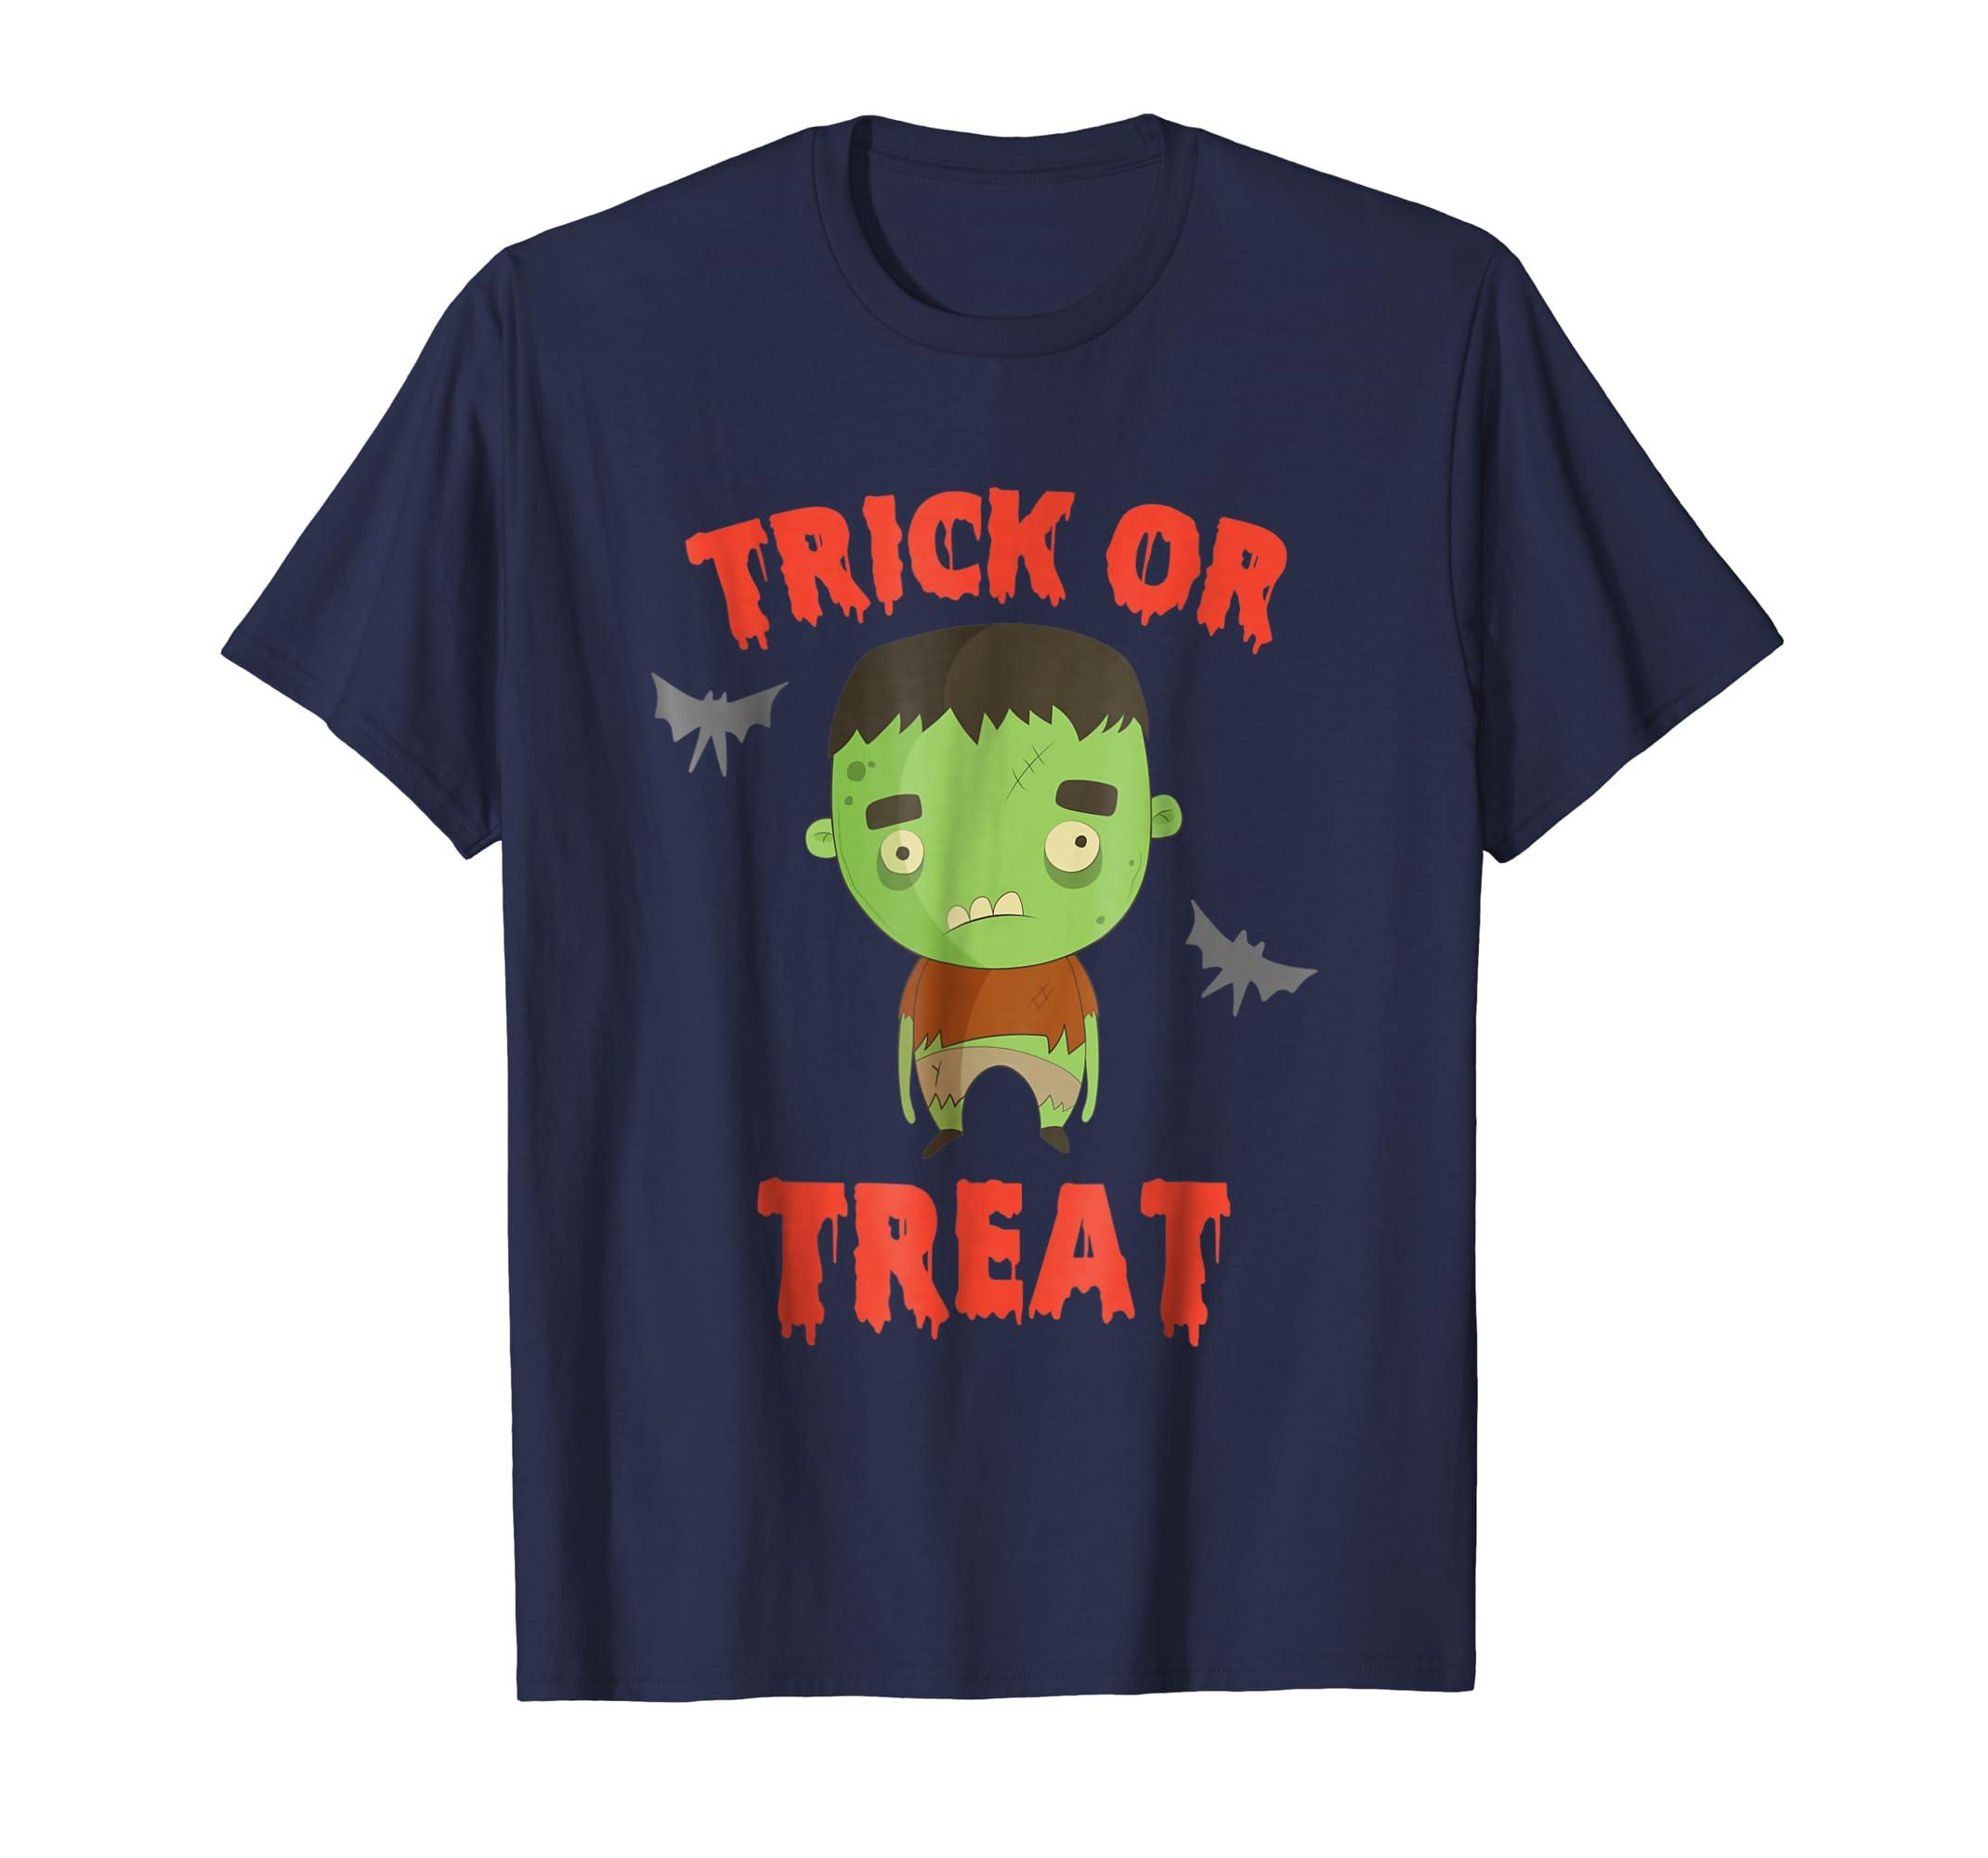 Cute halloween boys monster shirt - trick or treat- TPT